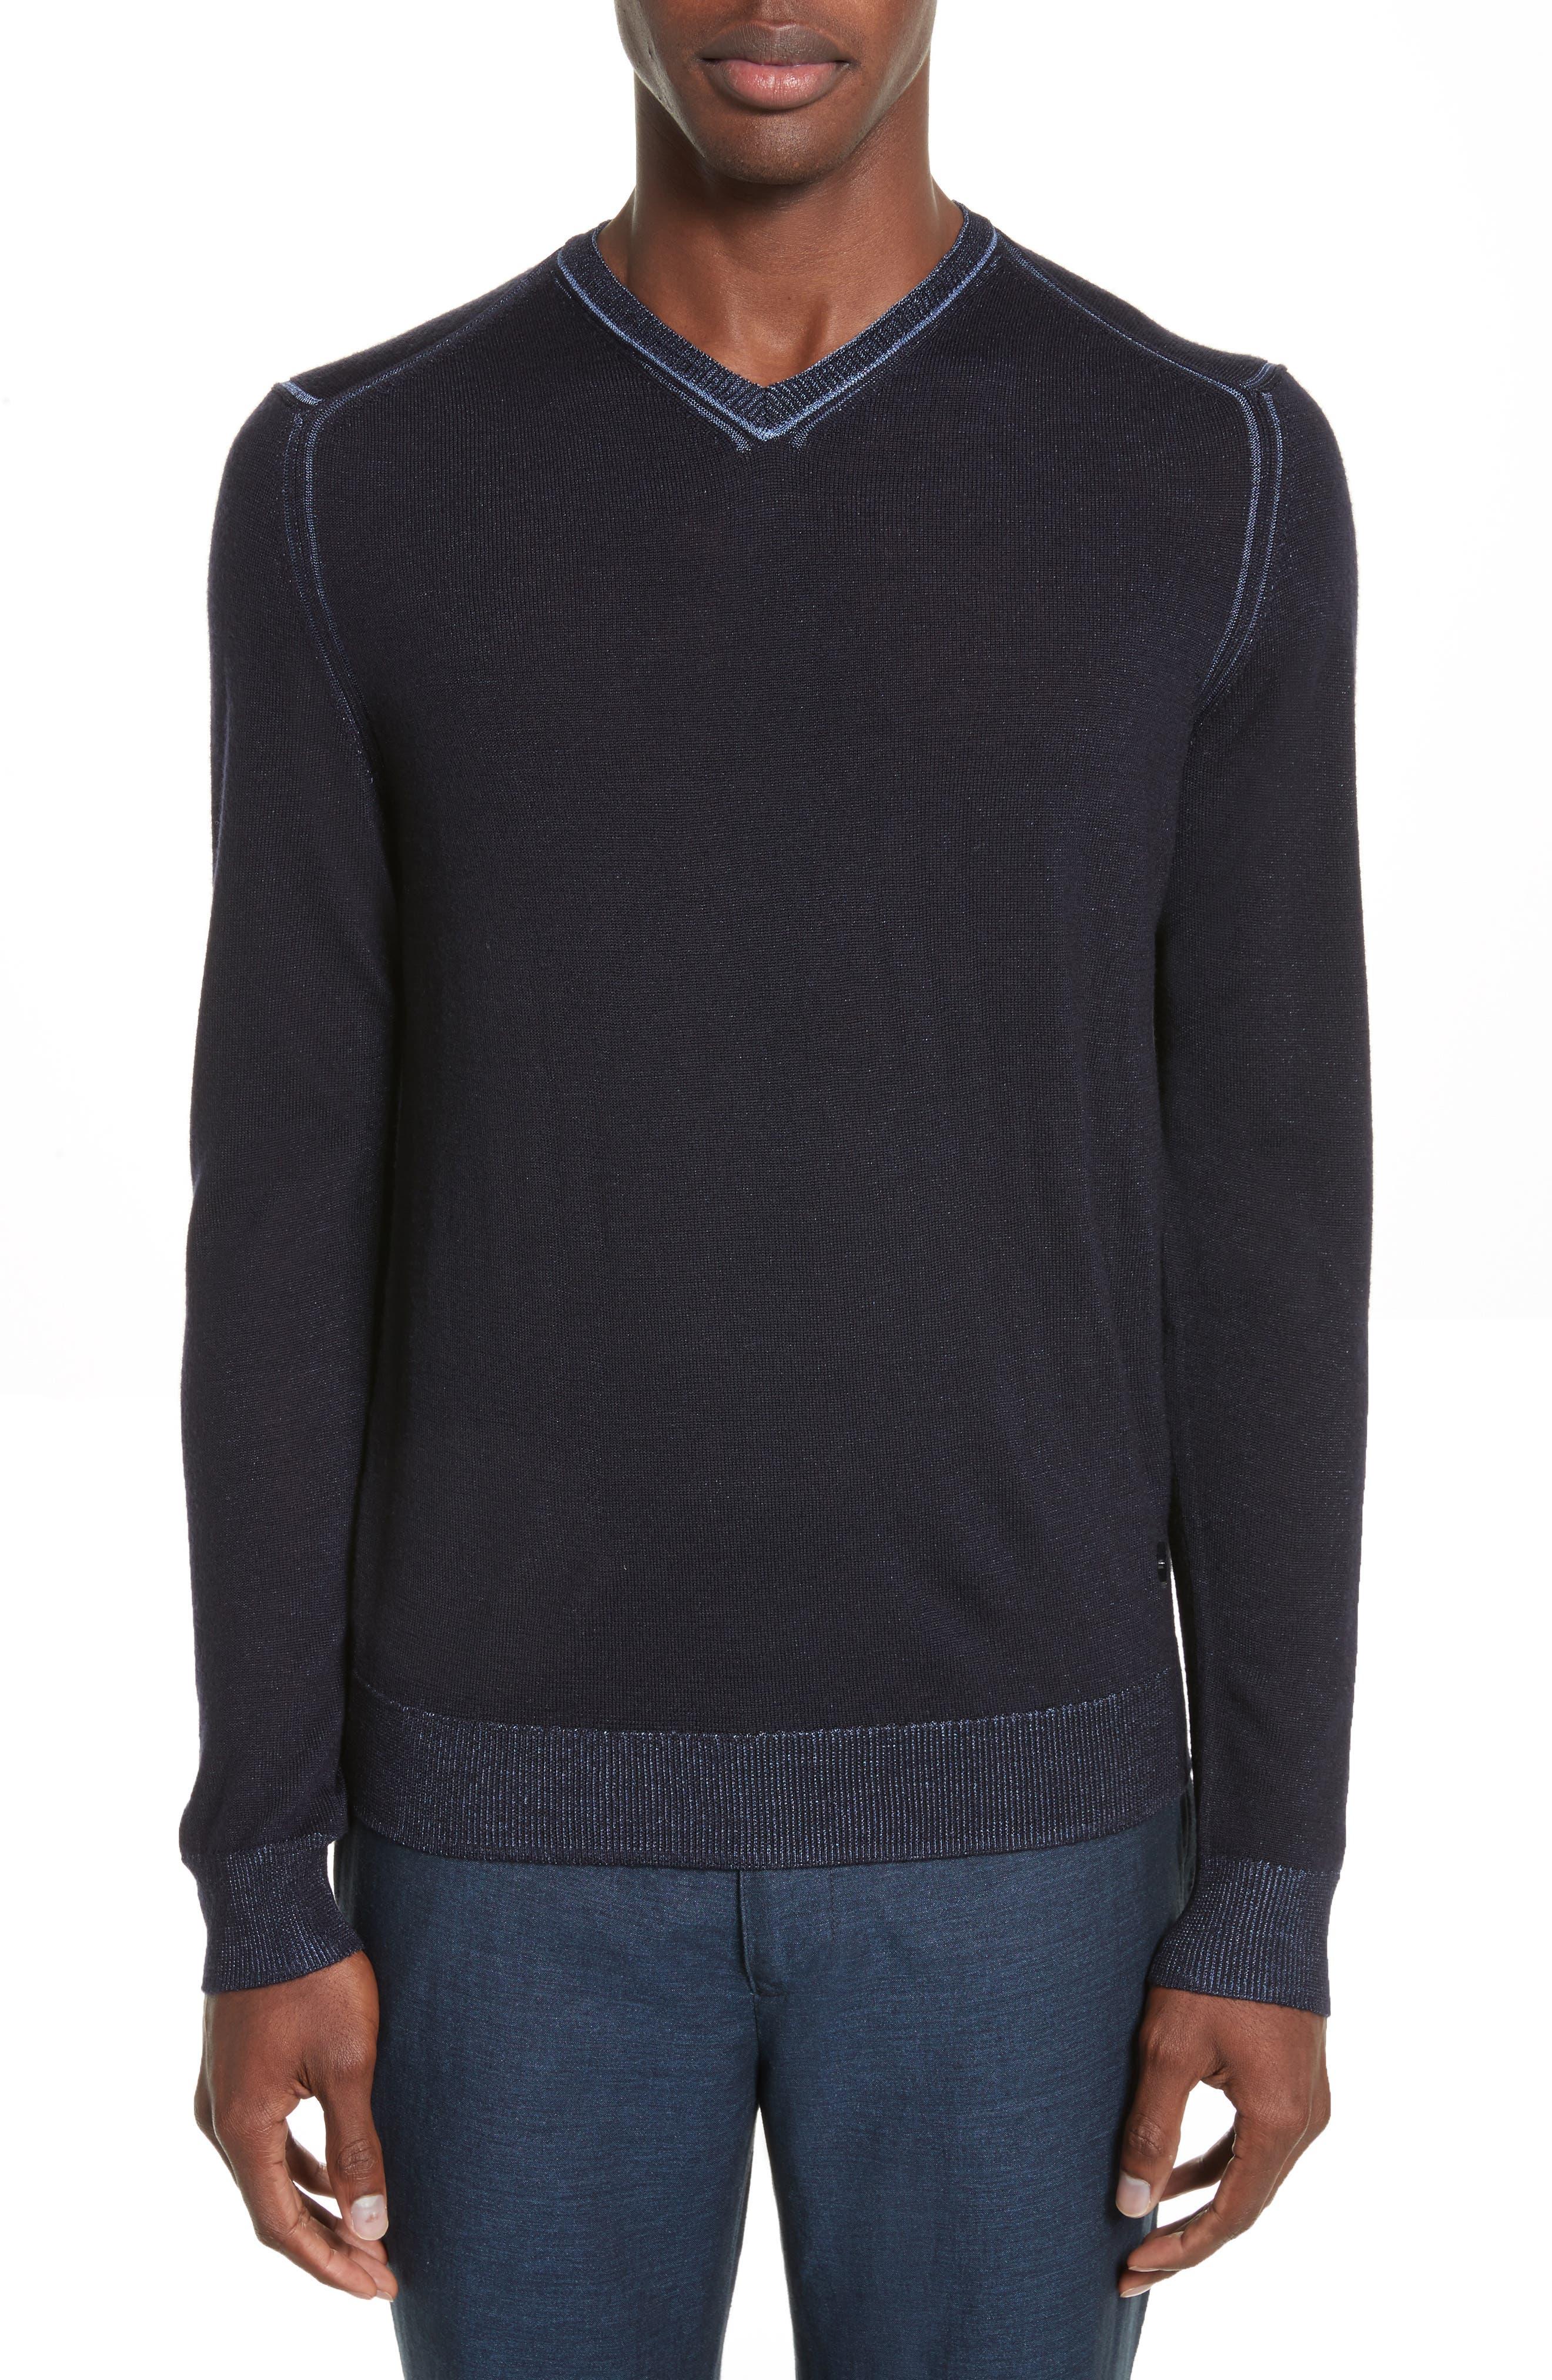 AJ V-Neck Sweater,                         Main,                         color, Night Blue